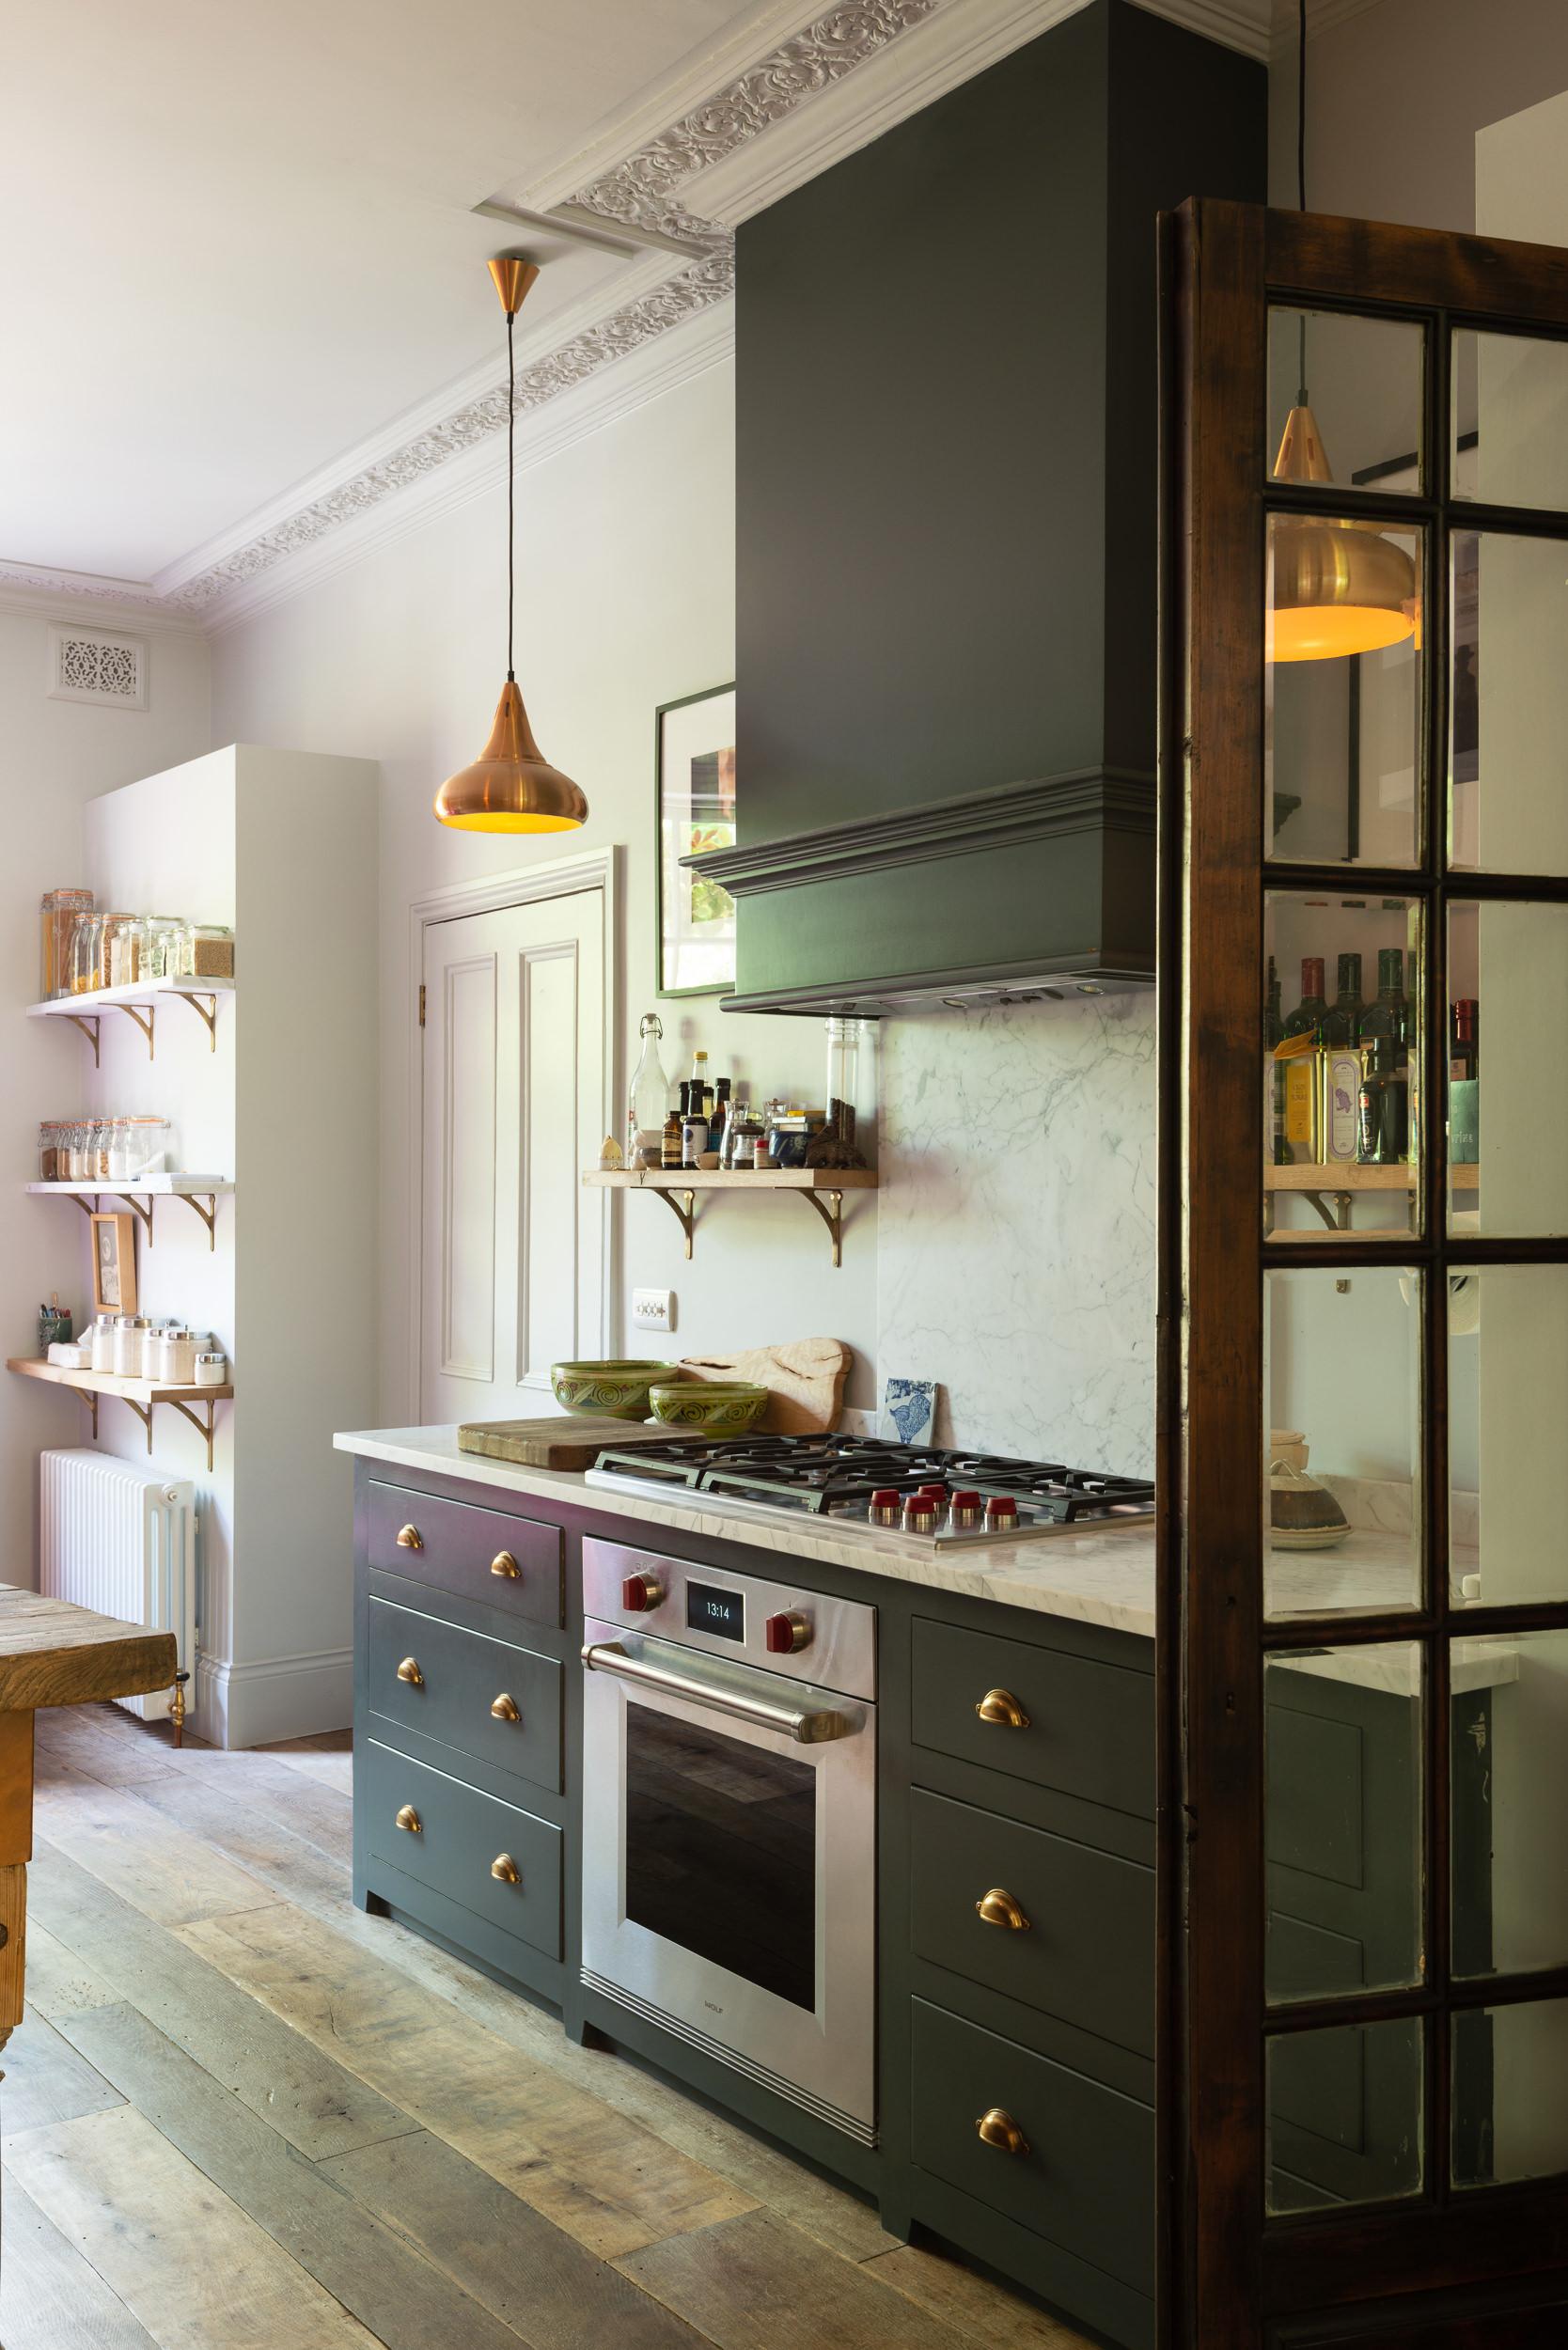 The Islington Townhouse Kitchen by deVOL